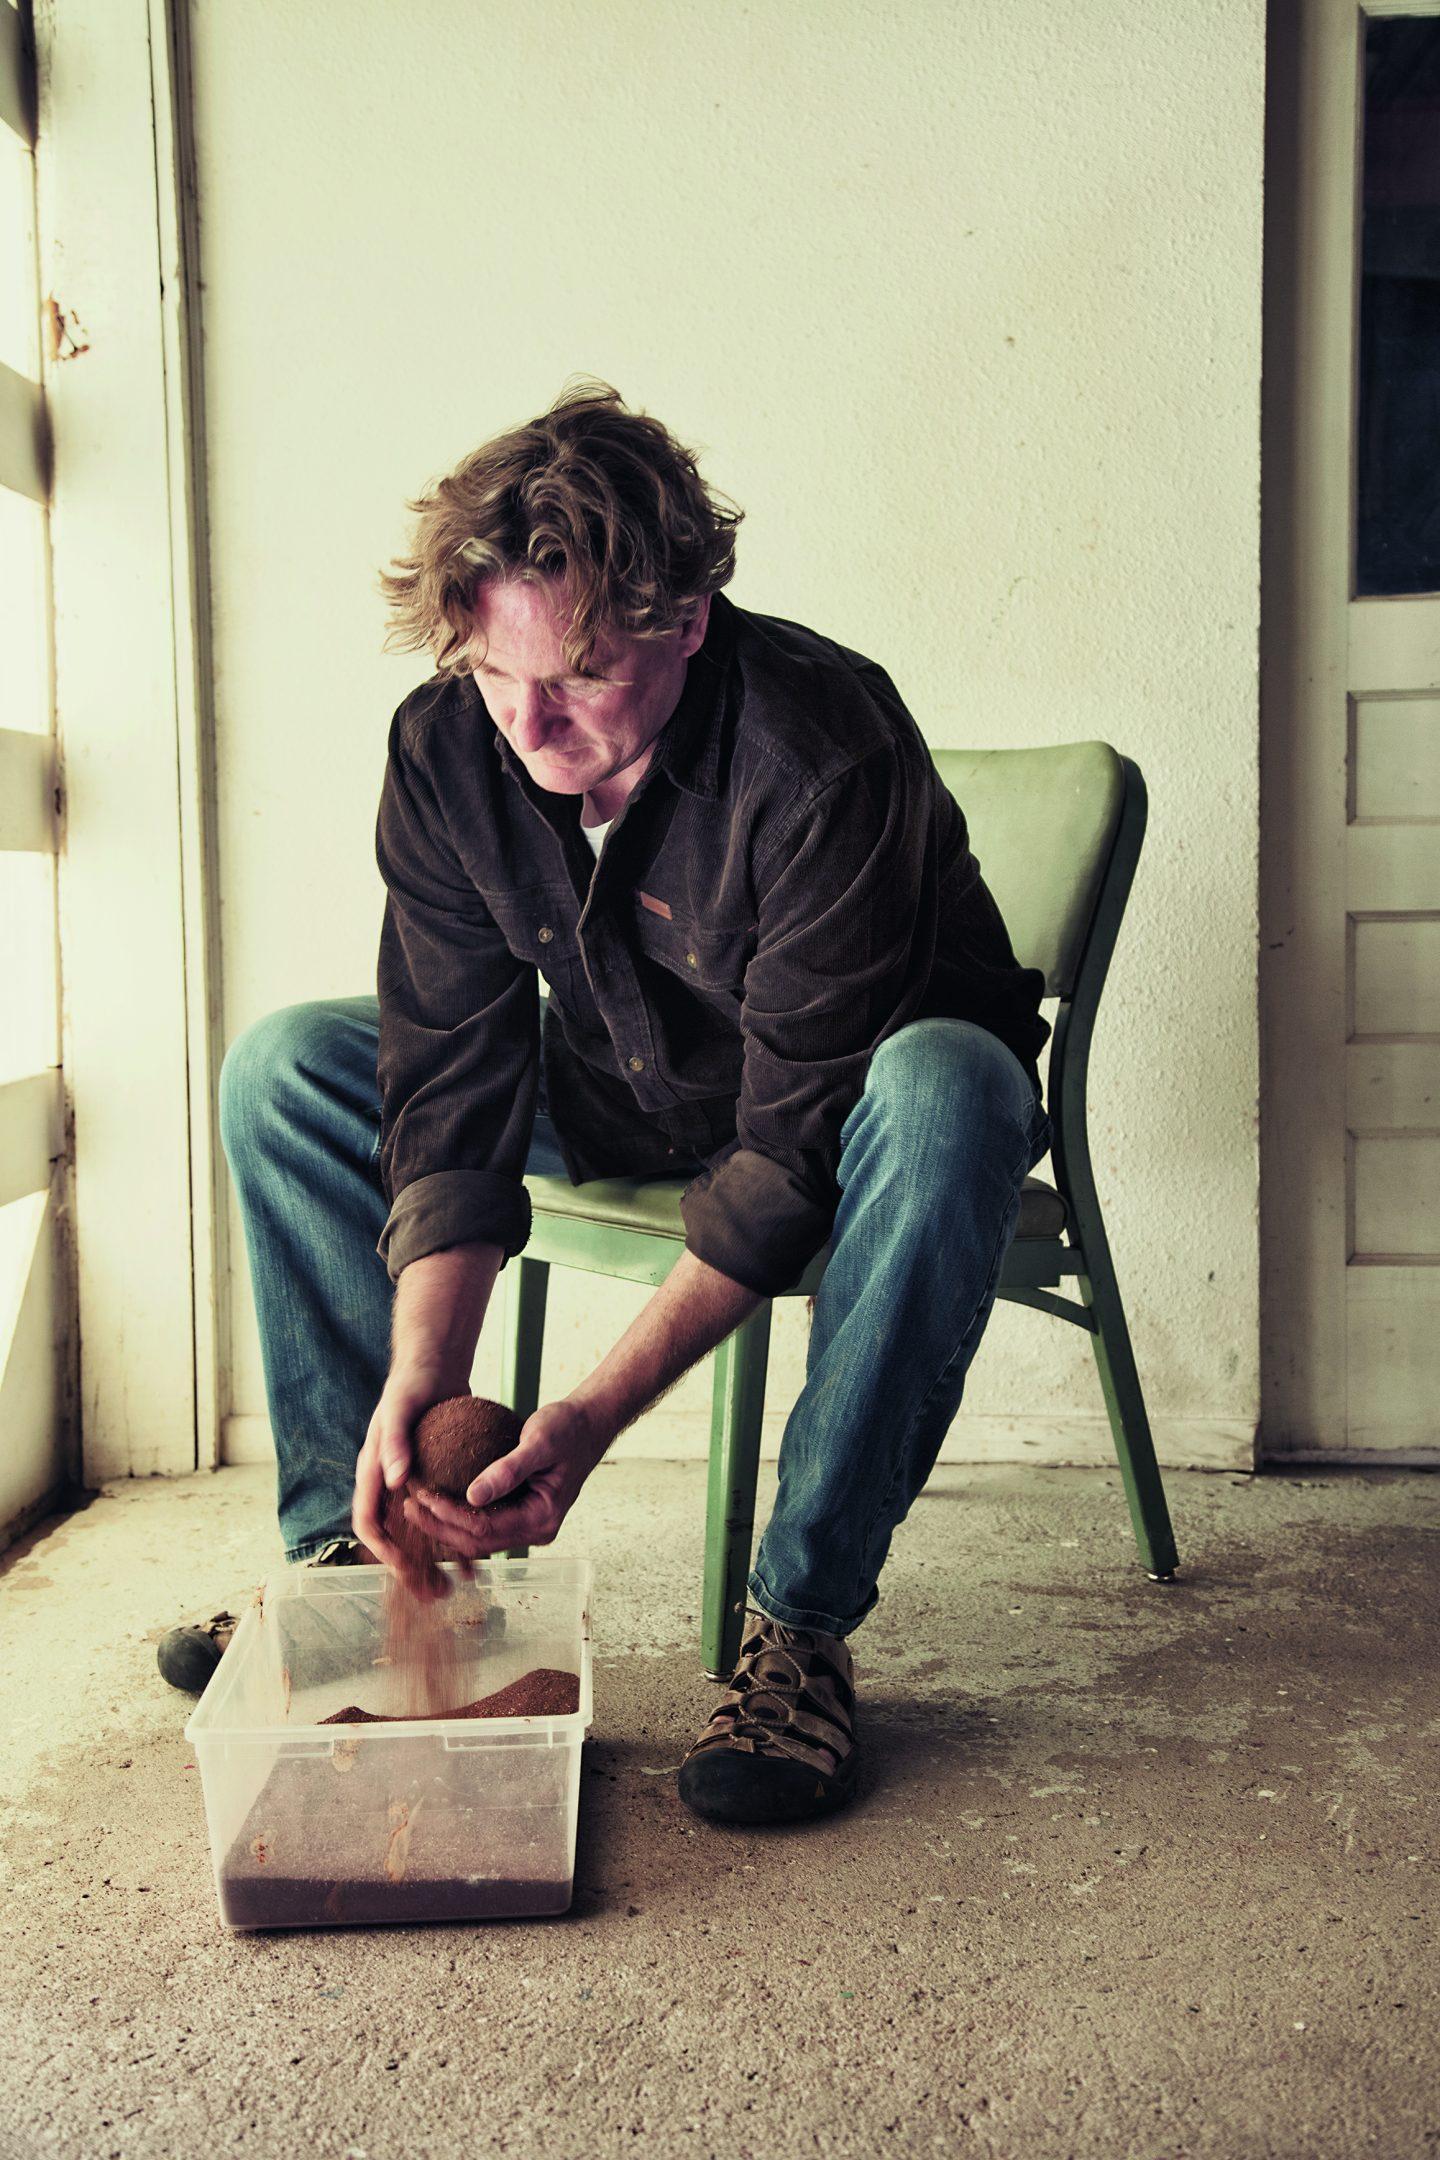 Dorodango: The Japanese Art of Making Mud Balls Laurence King Publishing